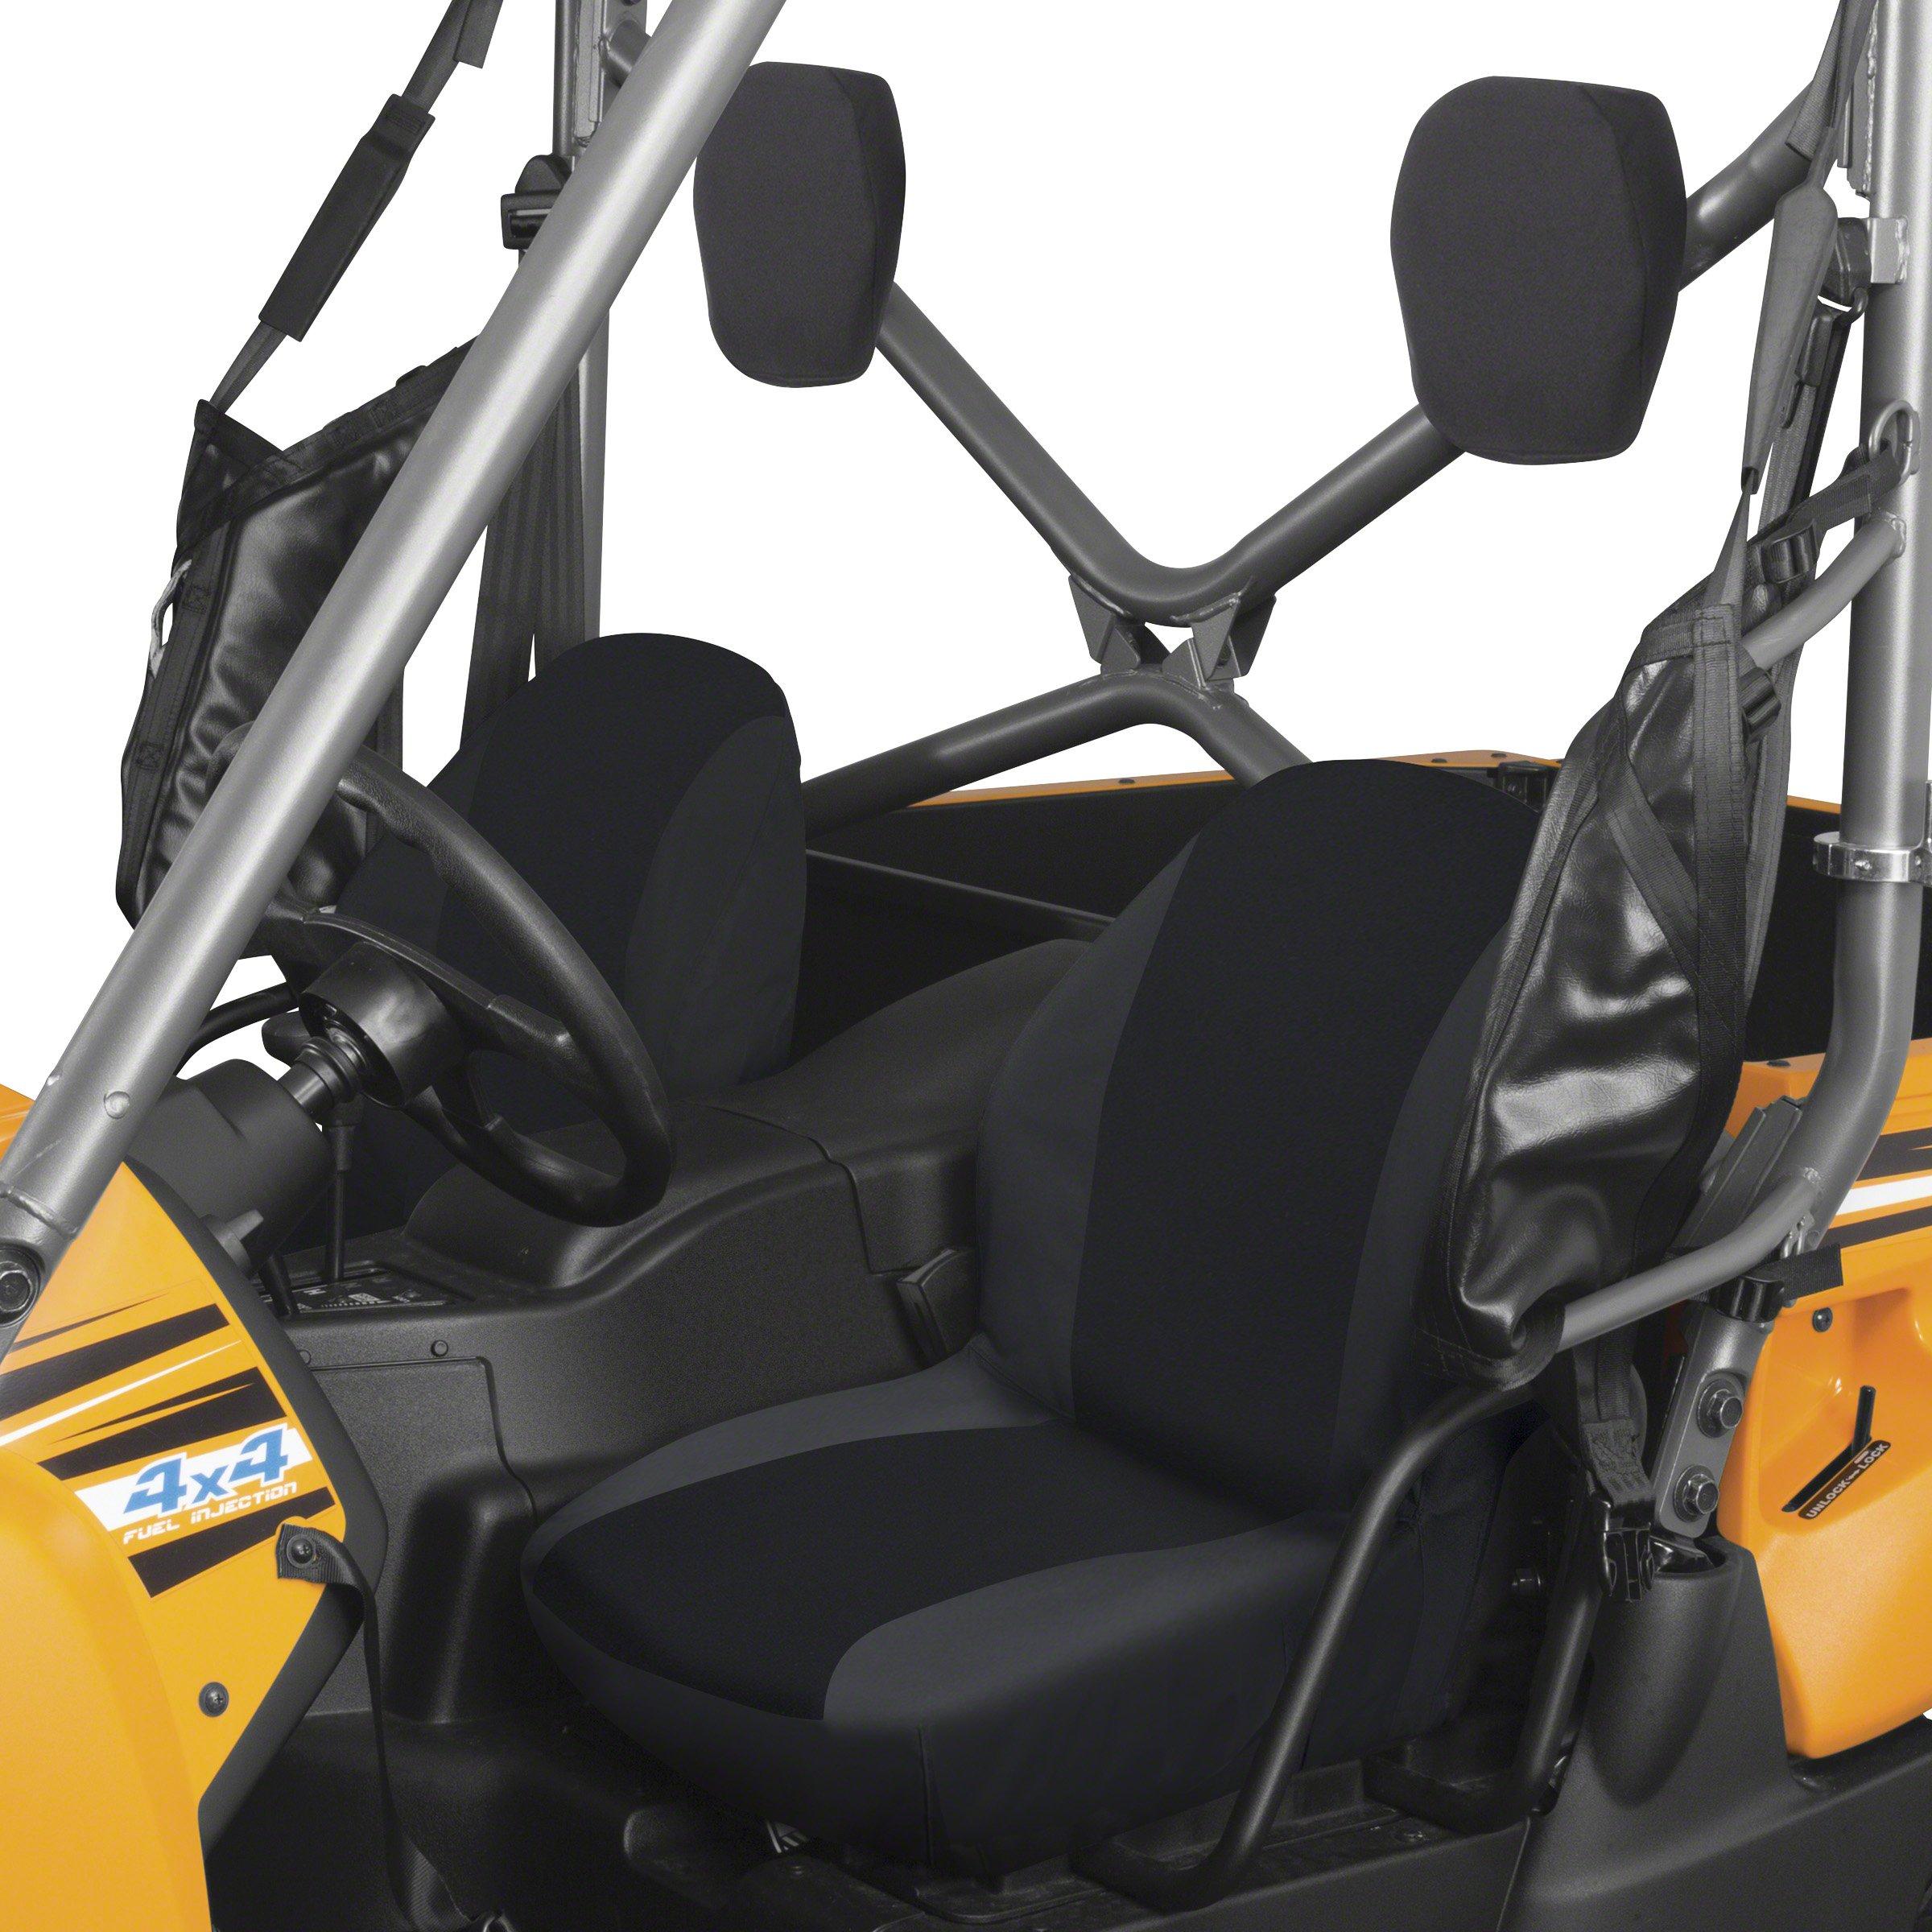 Classic Accessories QuadGear Black UTV Bucket Seat Cover by Classic Accessories